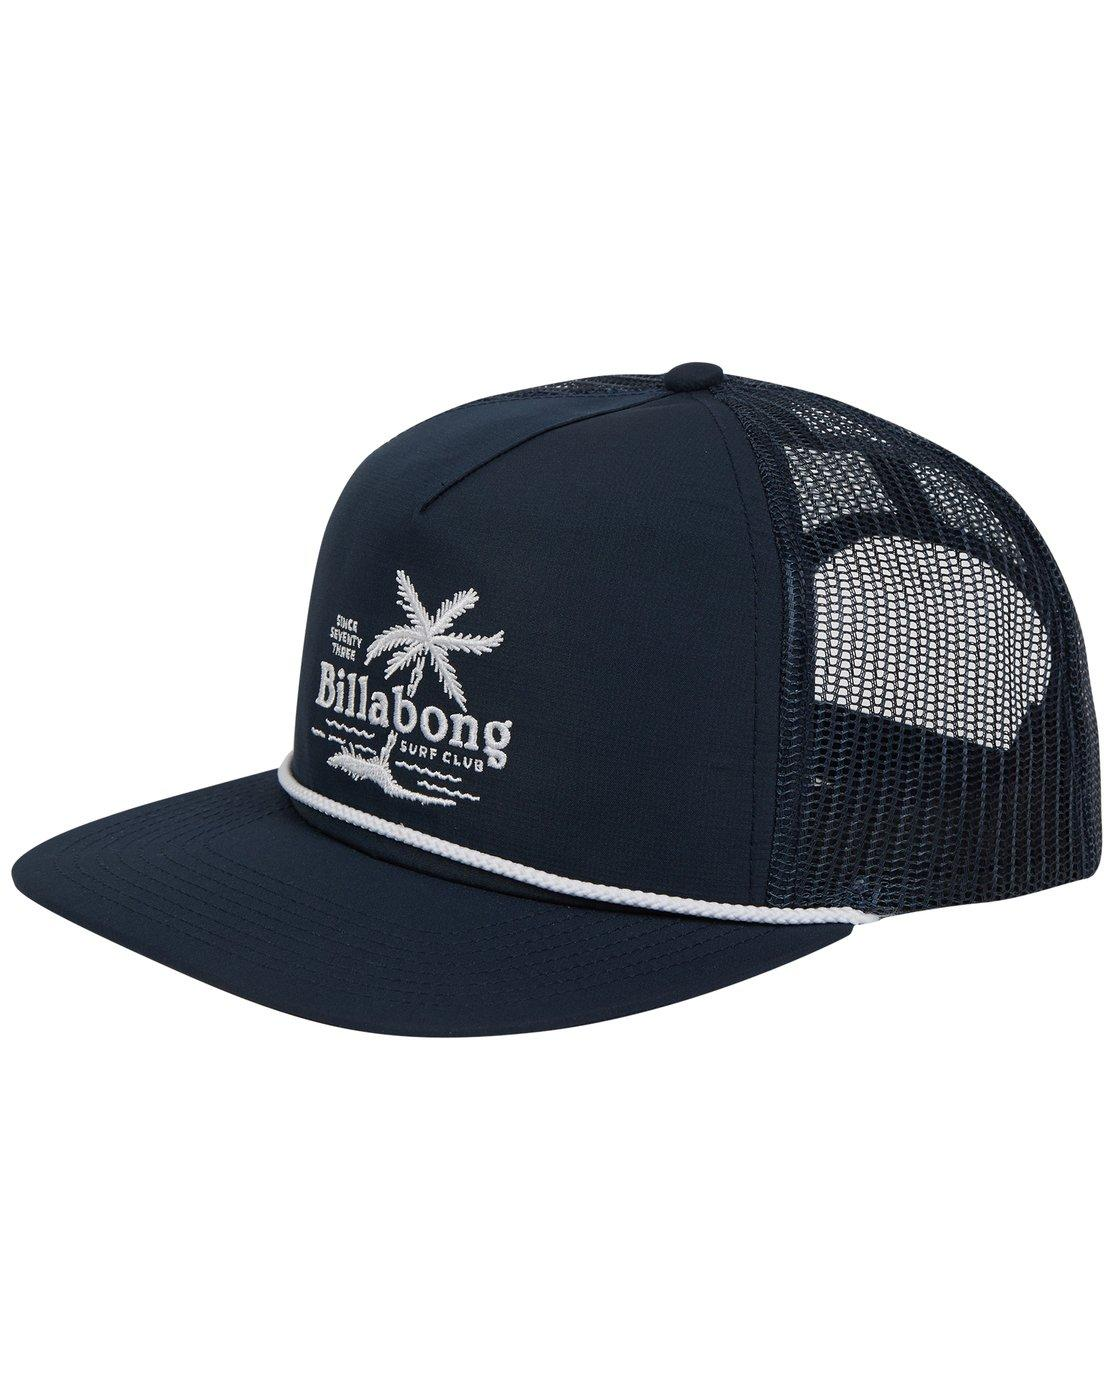 reputable site 57619 64a18 Lyst - Billabong Alliance Trucker Hat in Blue for Men